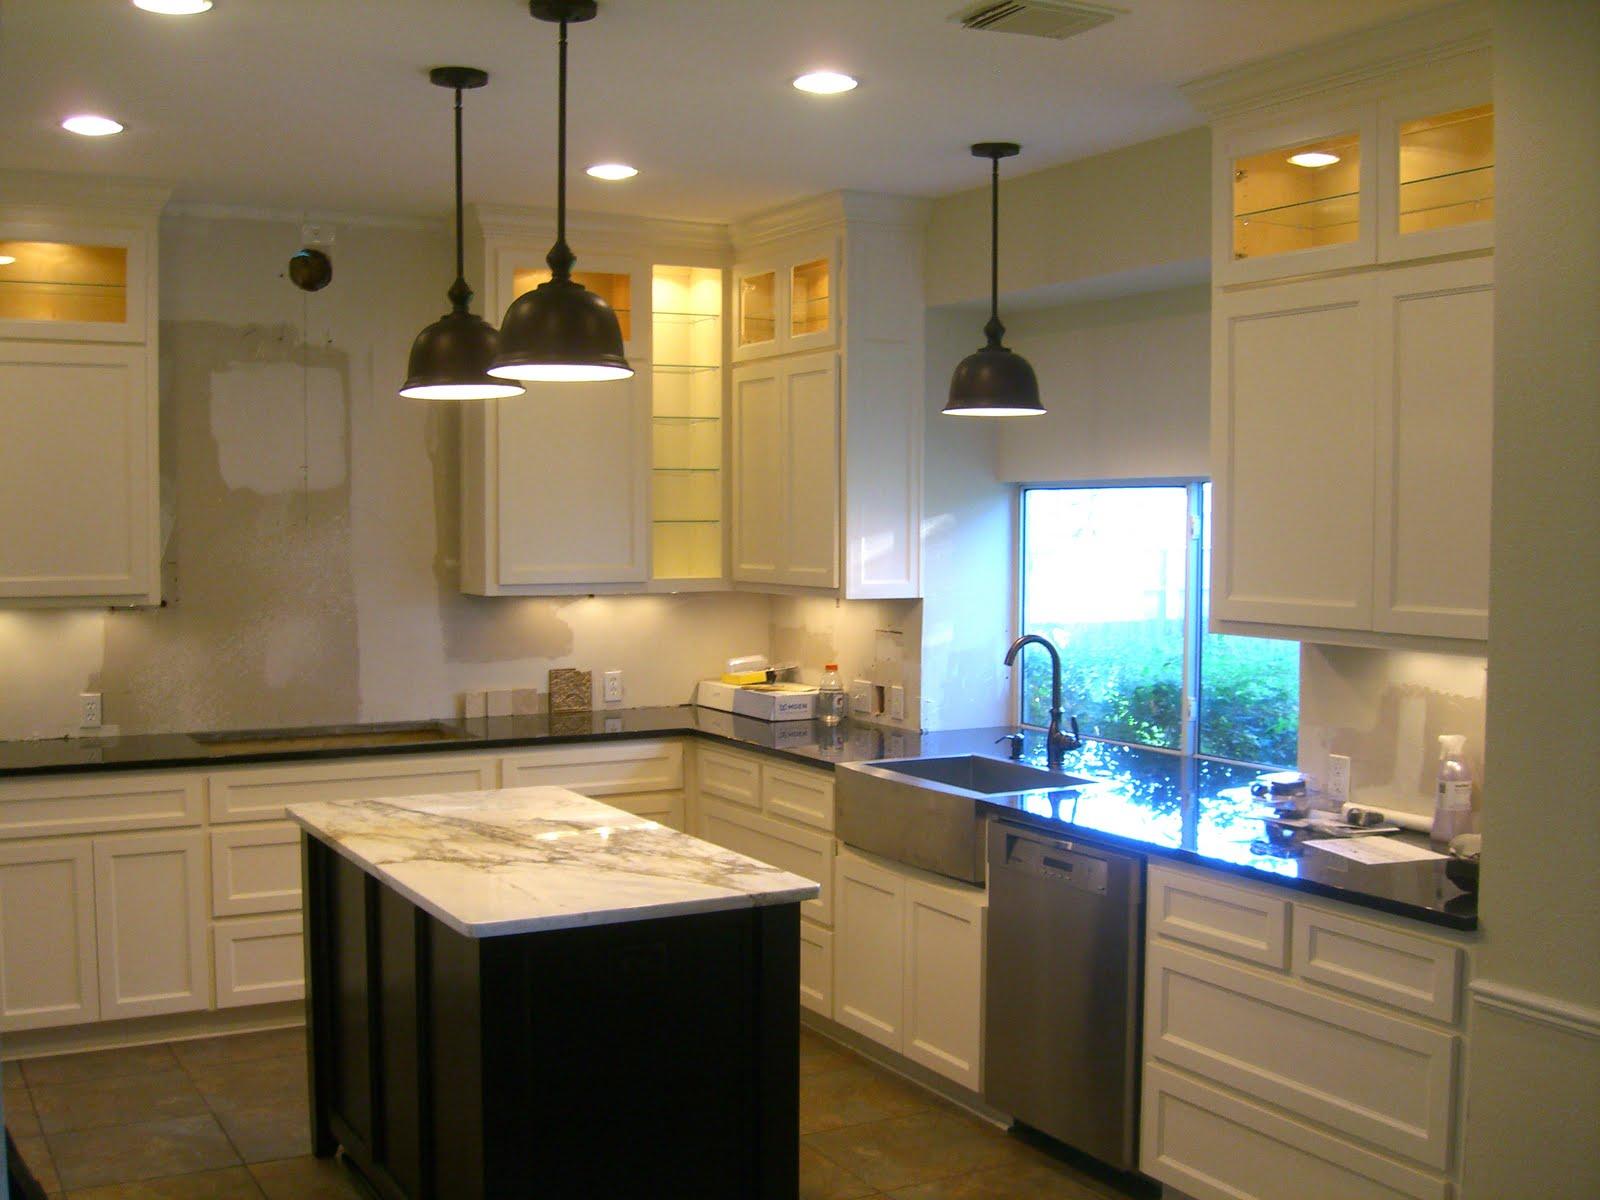 Lighting Kitchen Foset Simple Home Decoration